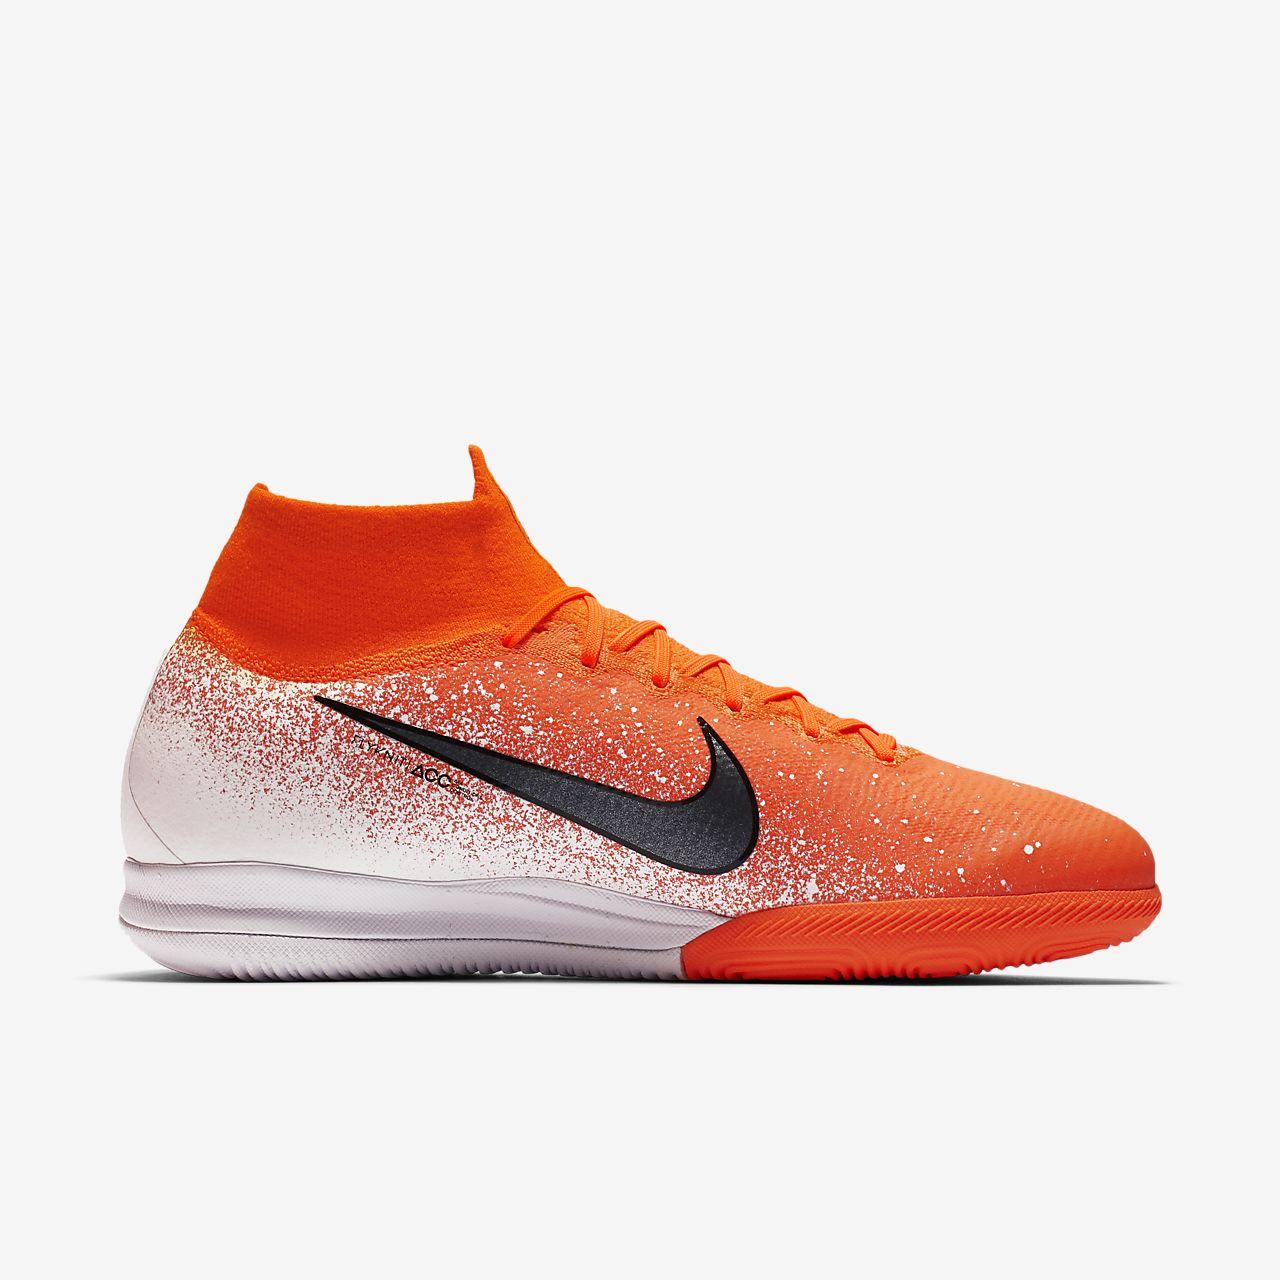 798c6dee57e Nike SuperflyX 6 Elite IC Men s Indoor Court Football Boot. Nike.com CA